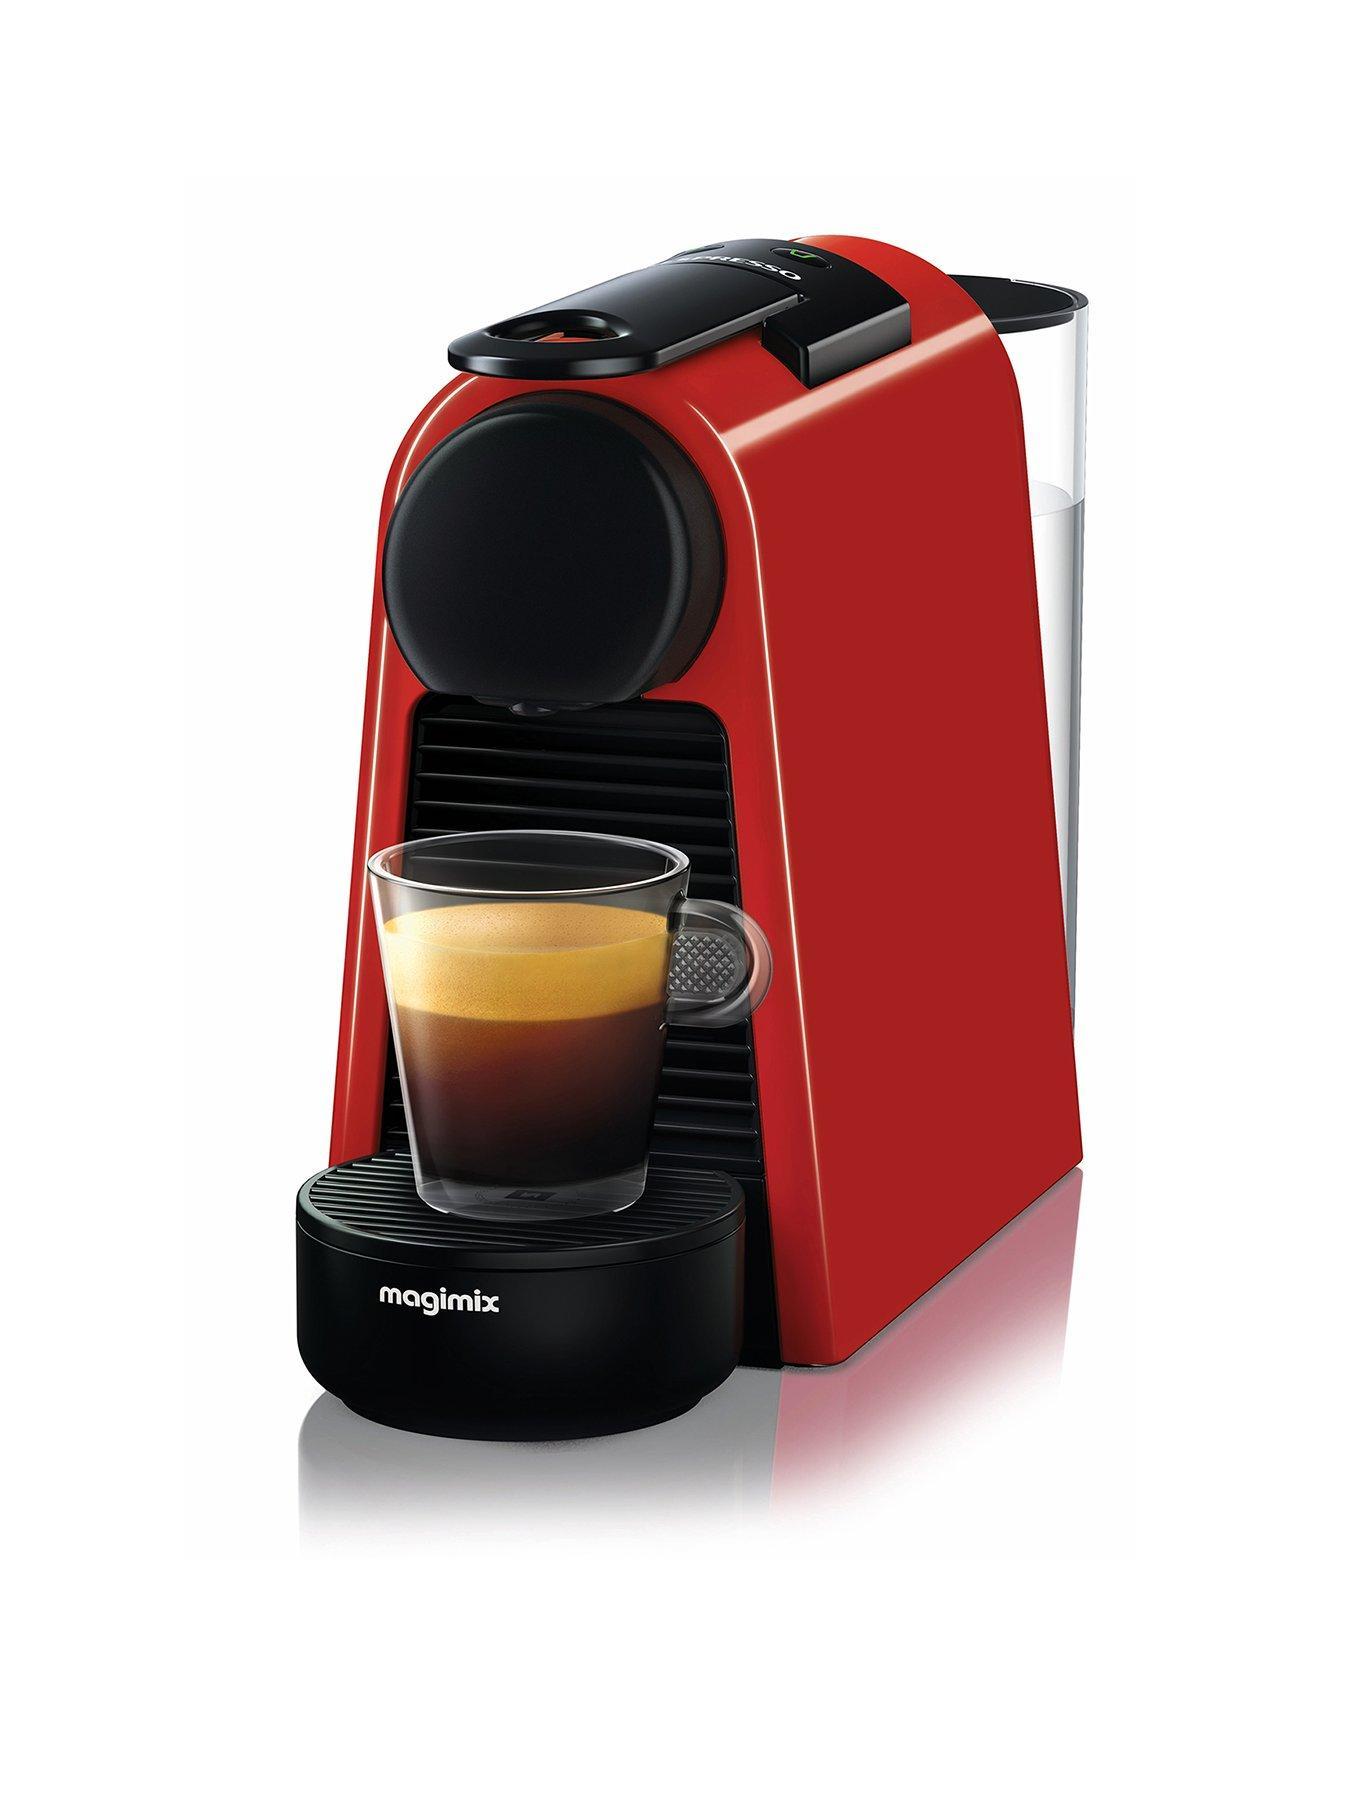 Valentine's Day Gift for Coffee Addicts: Magimix Mini Coffee Machine